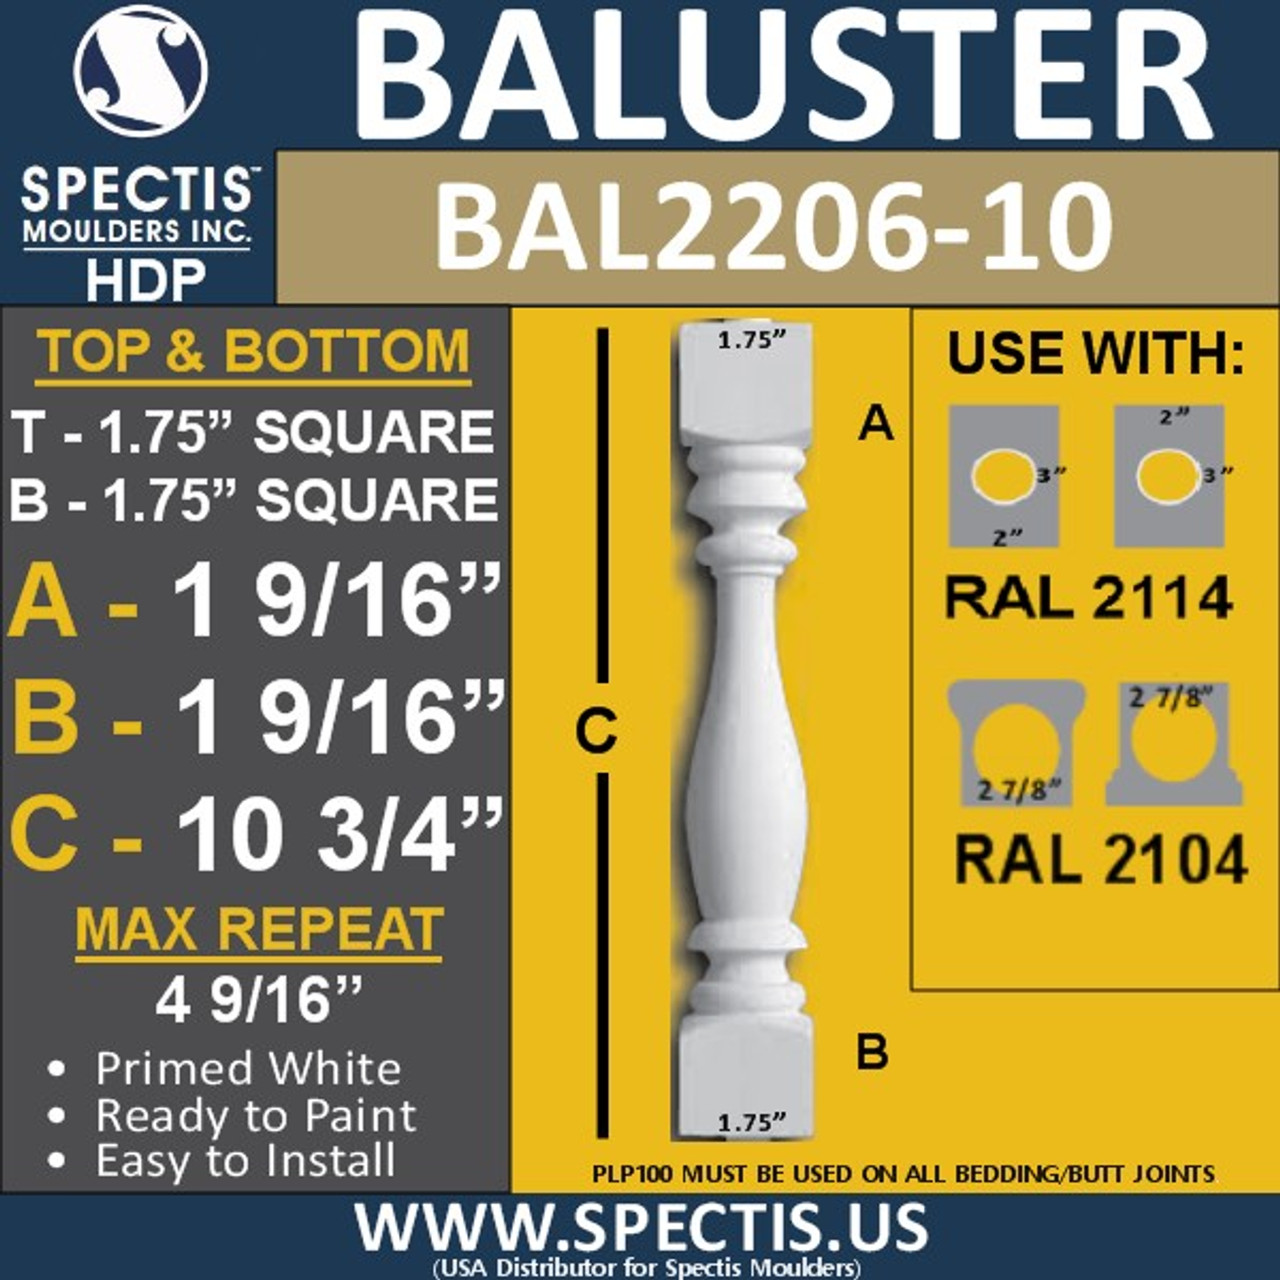 "BAL2206-10 Spectis Urethane Railing Baluster 1 3/4"" x 10 3/4"""